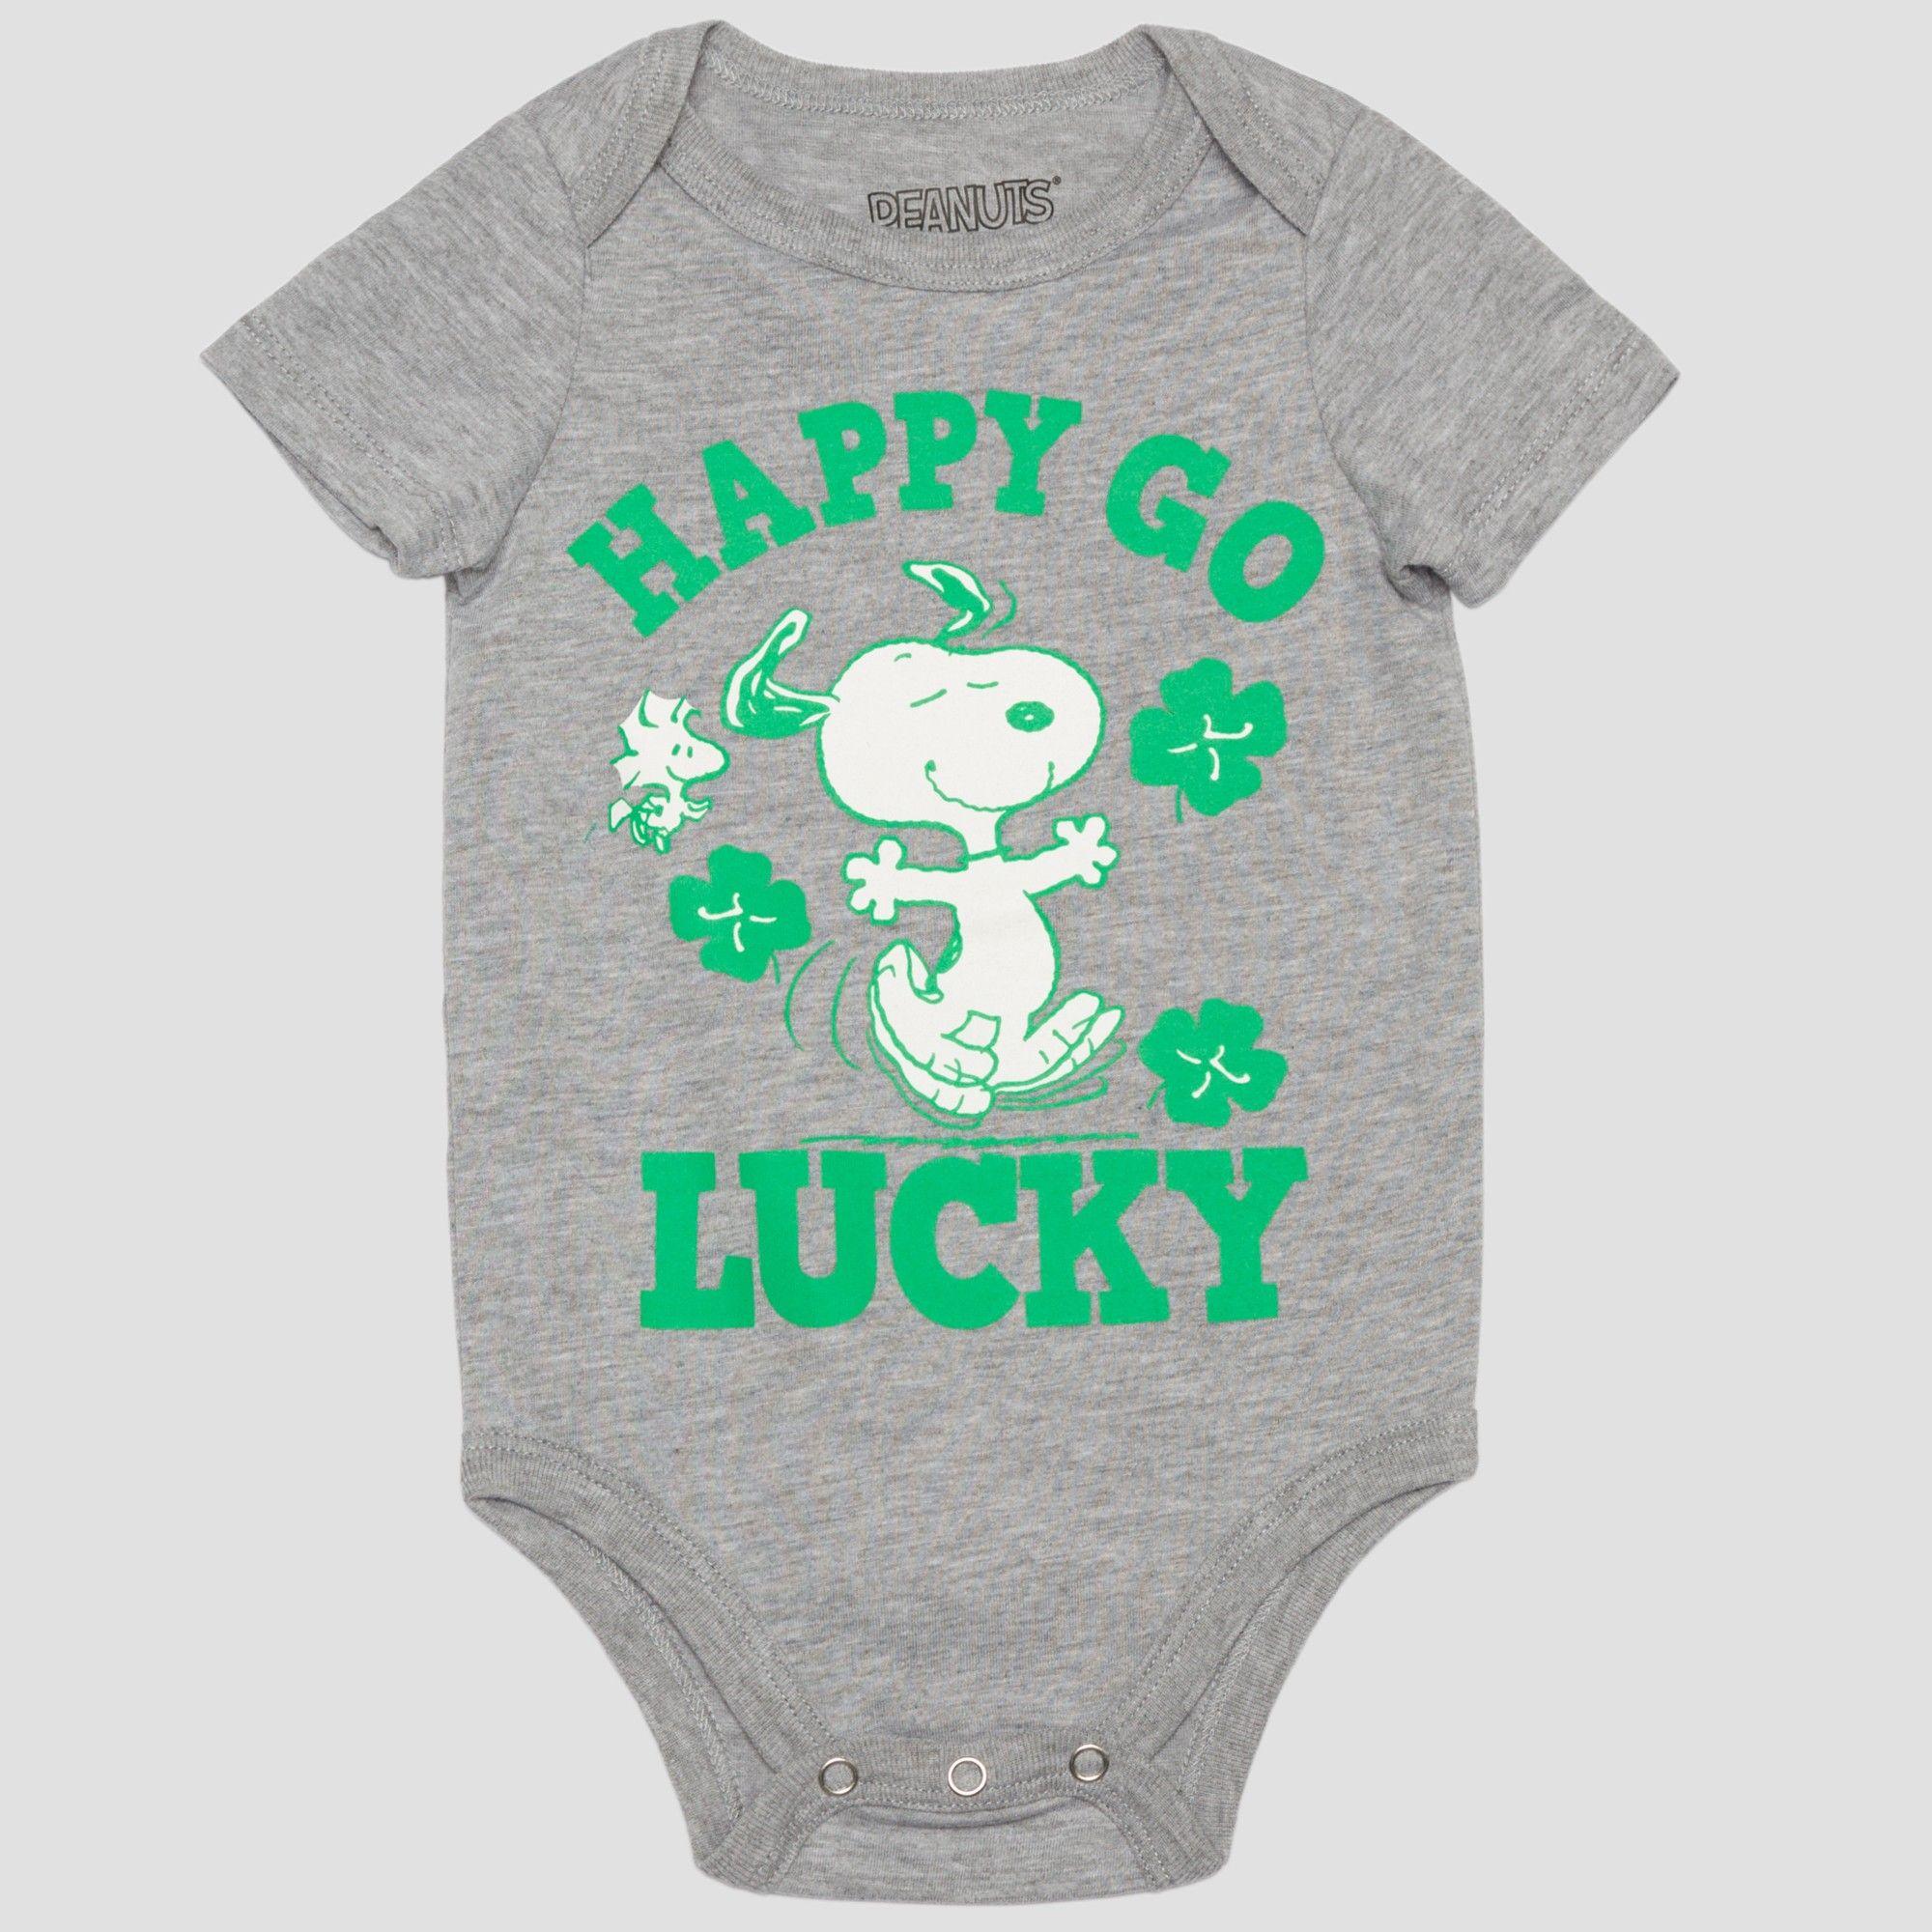 198c5d8c9 Peanuts Baby Boys' Snoopy 'happy GO Lucky' Short Sleeve Bodysuit -  Gray/Green 24M